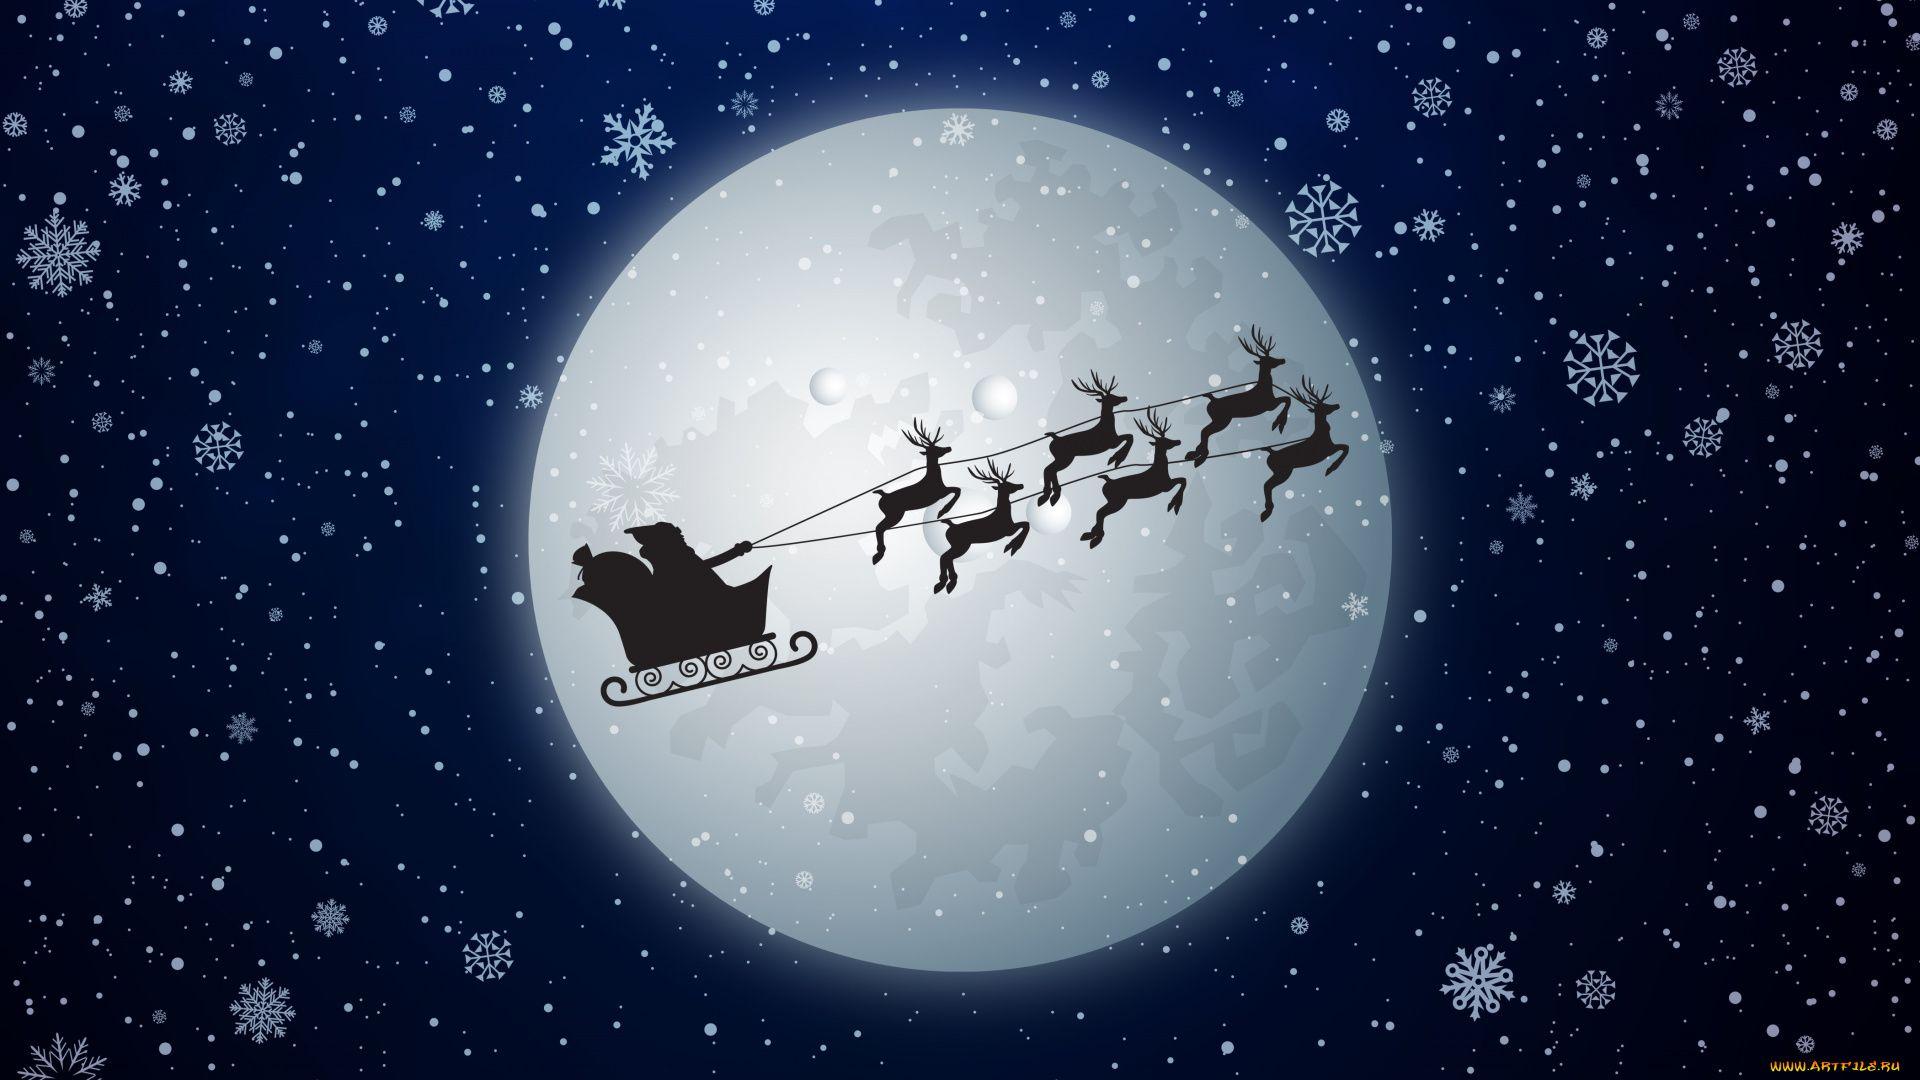 Christmas Sleigh pc wallpaper